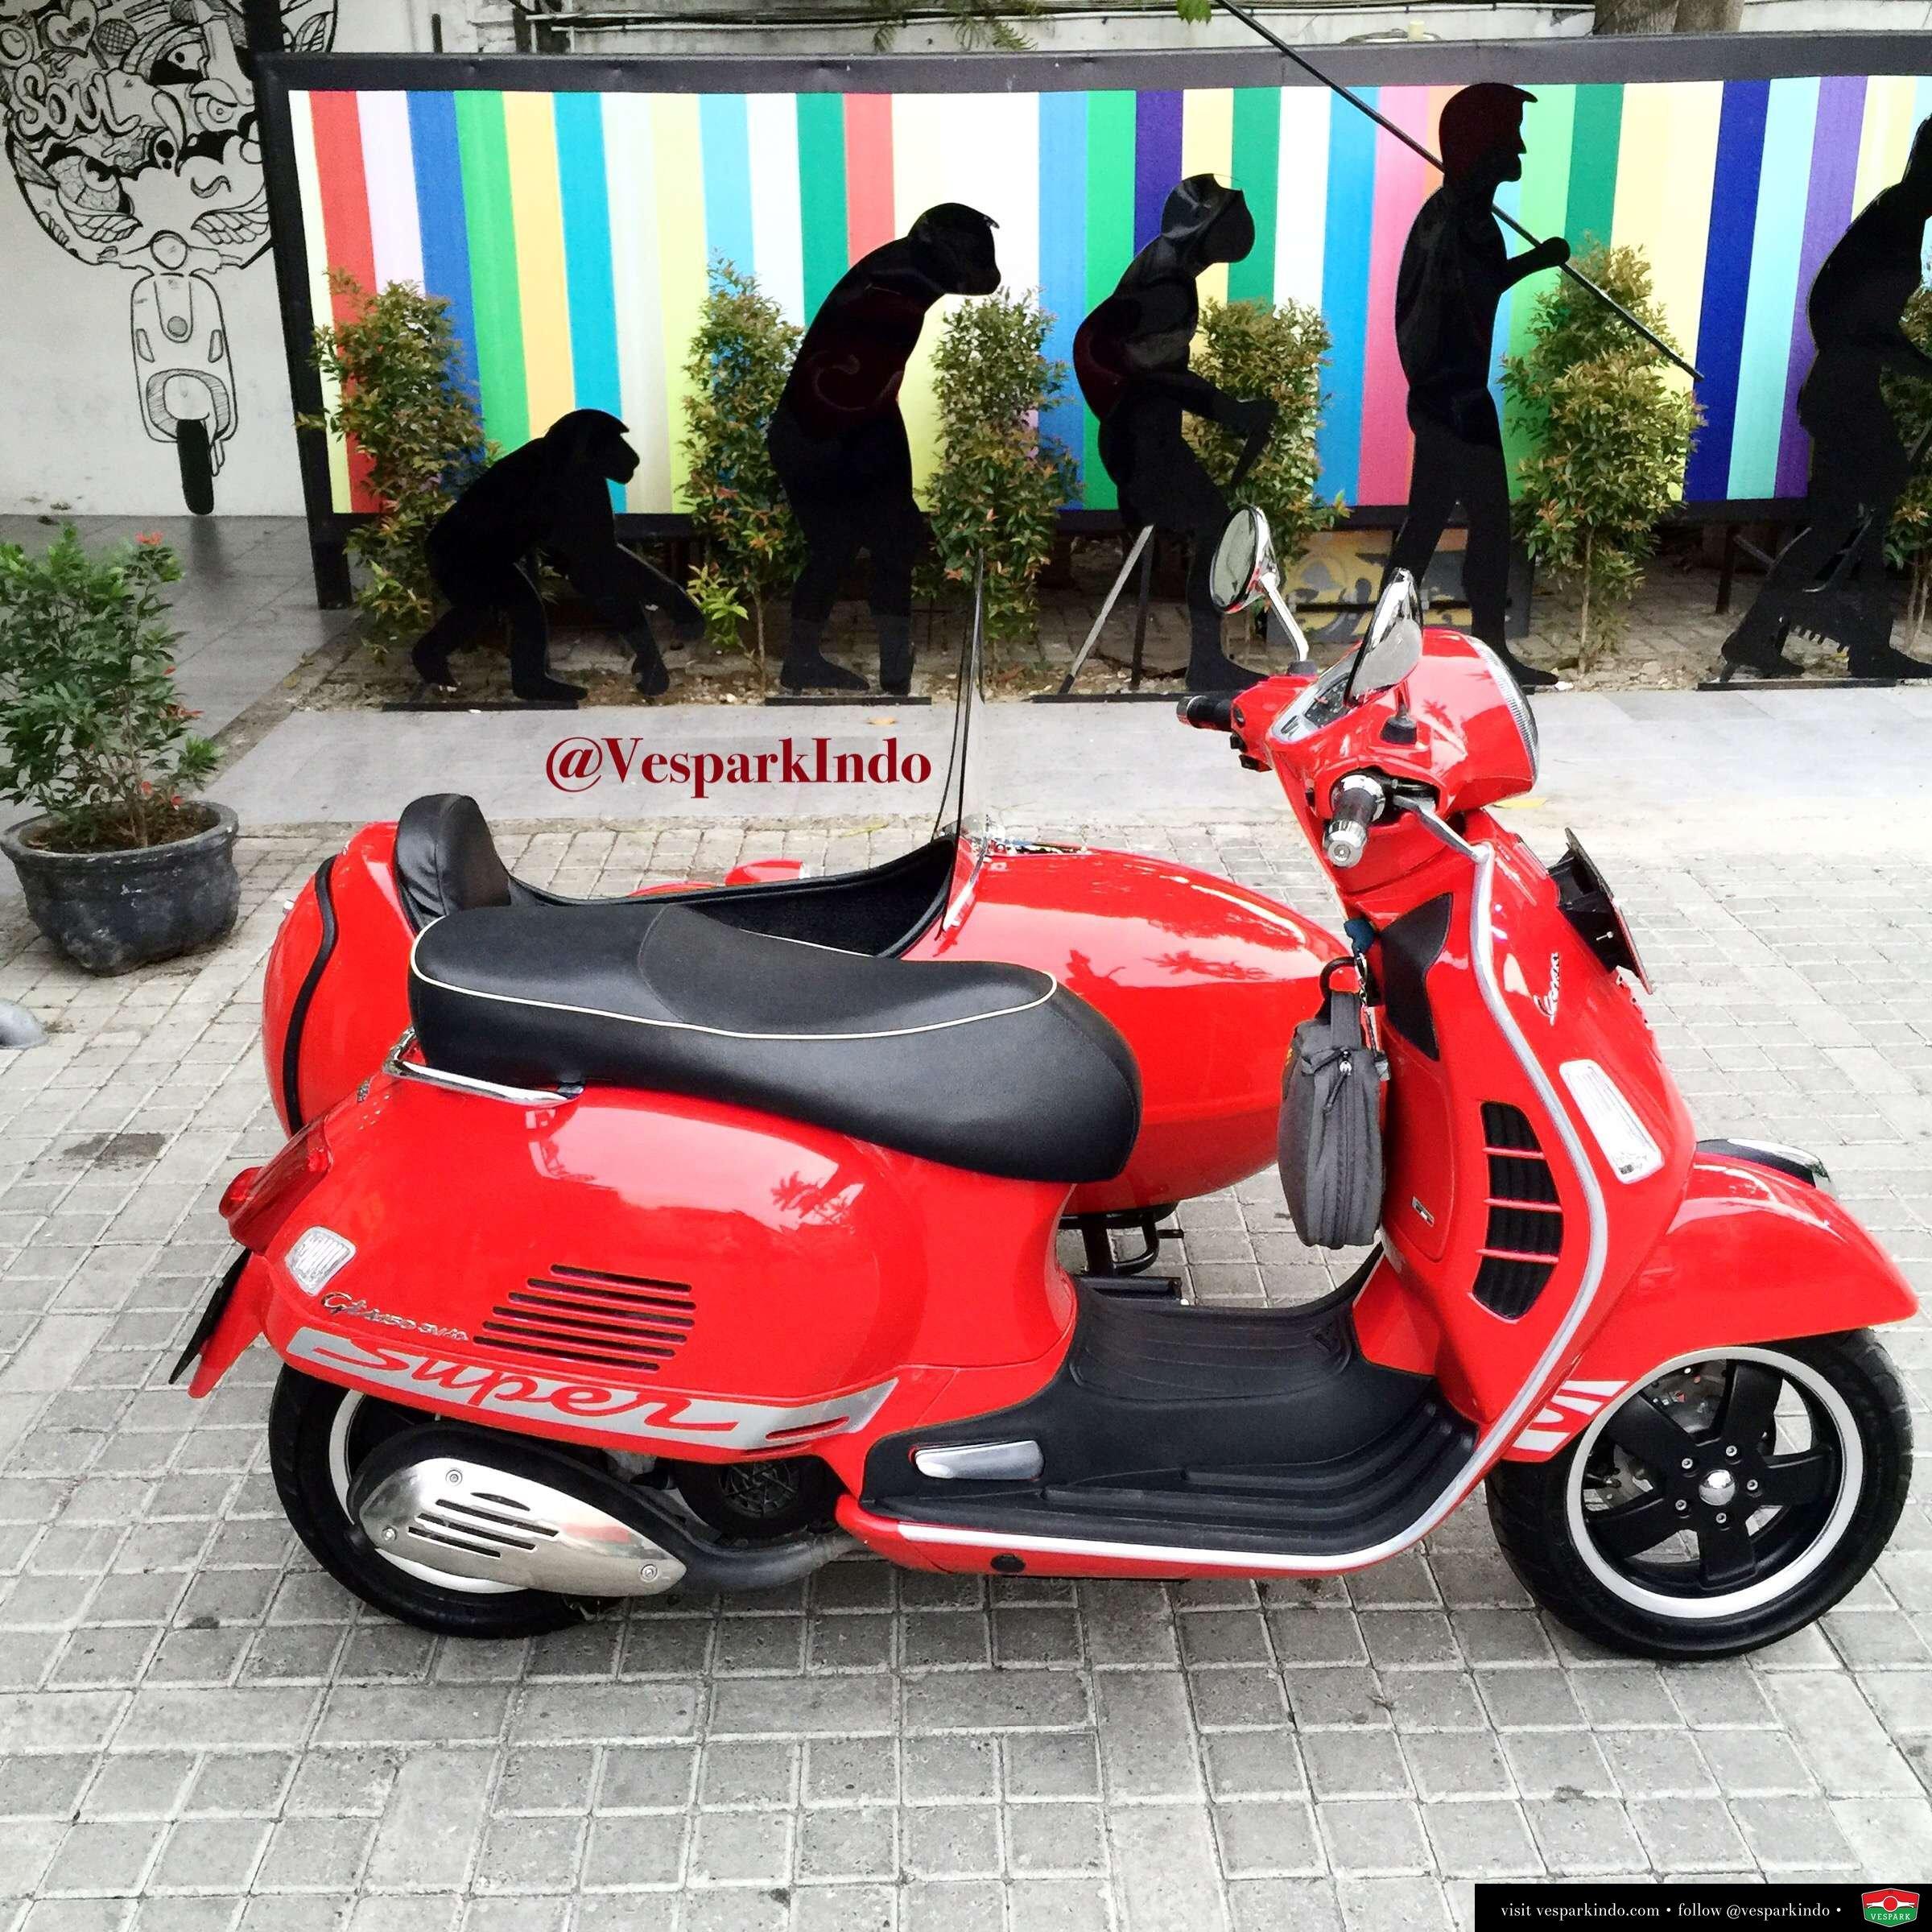 Vespa Sidecar | Vespa Medan Vespark